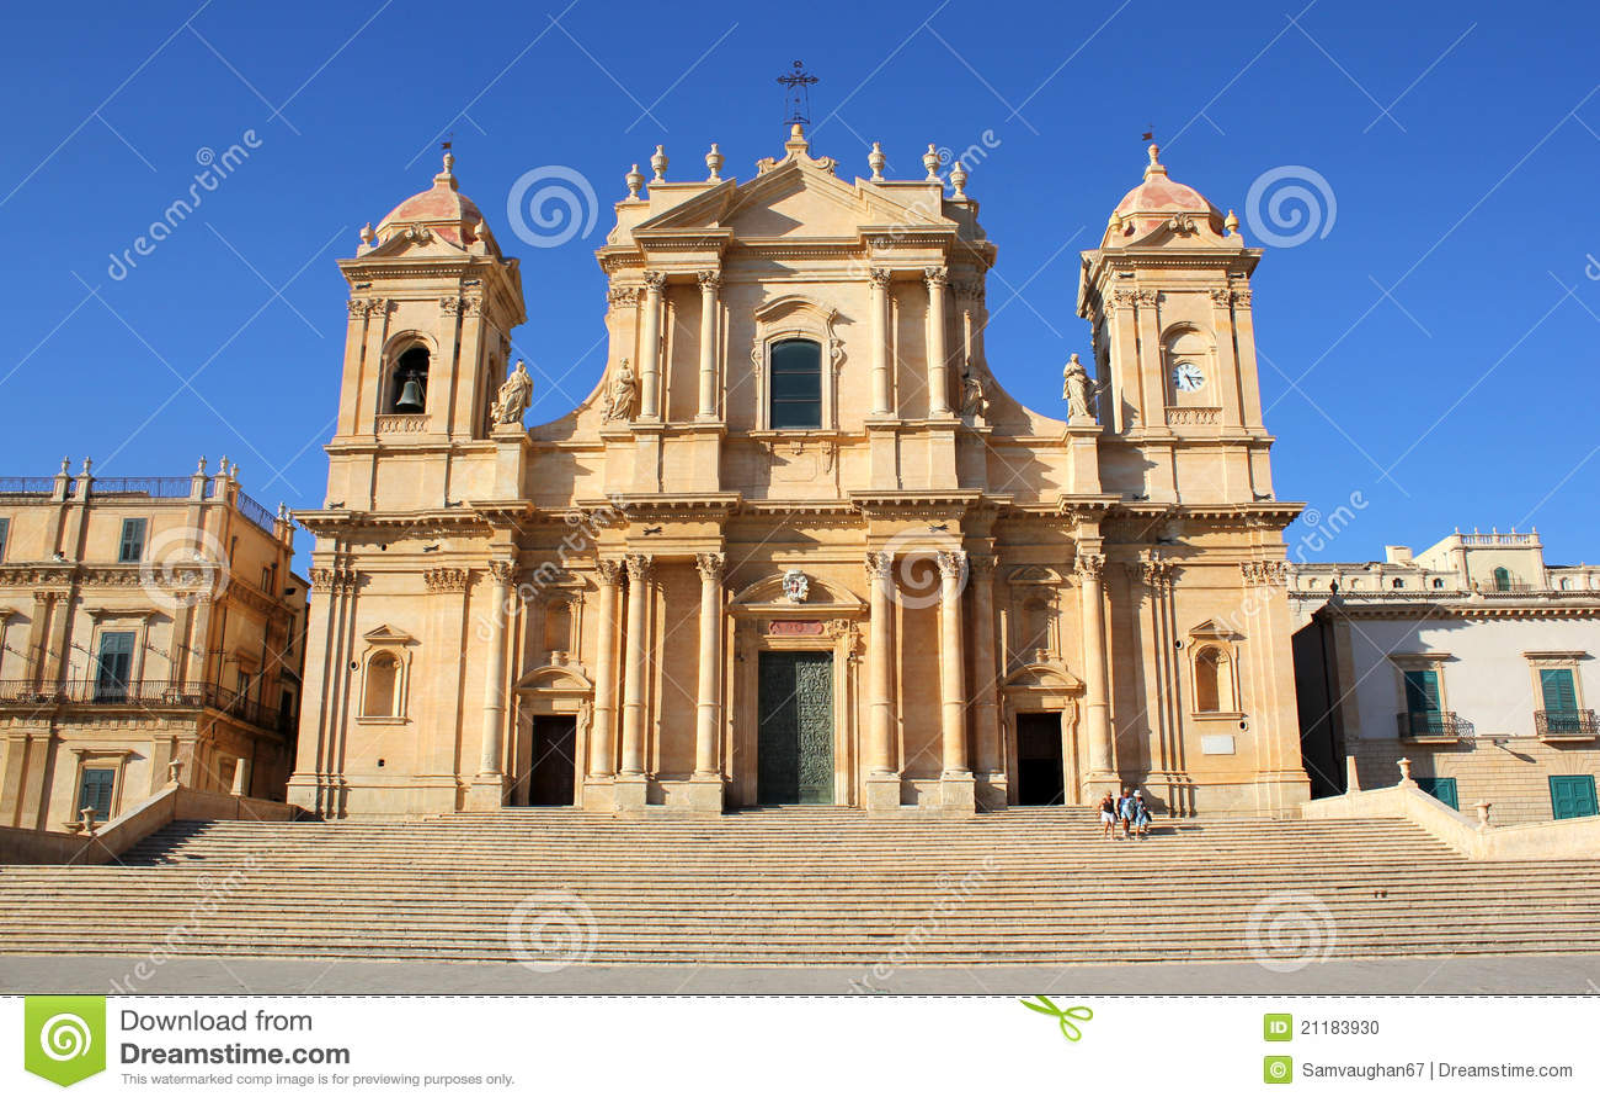 San Nicolo Cathedral in Noto